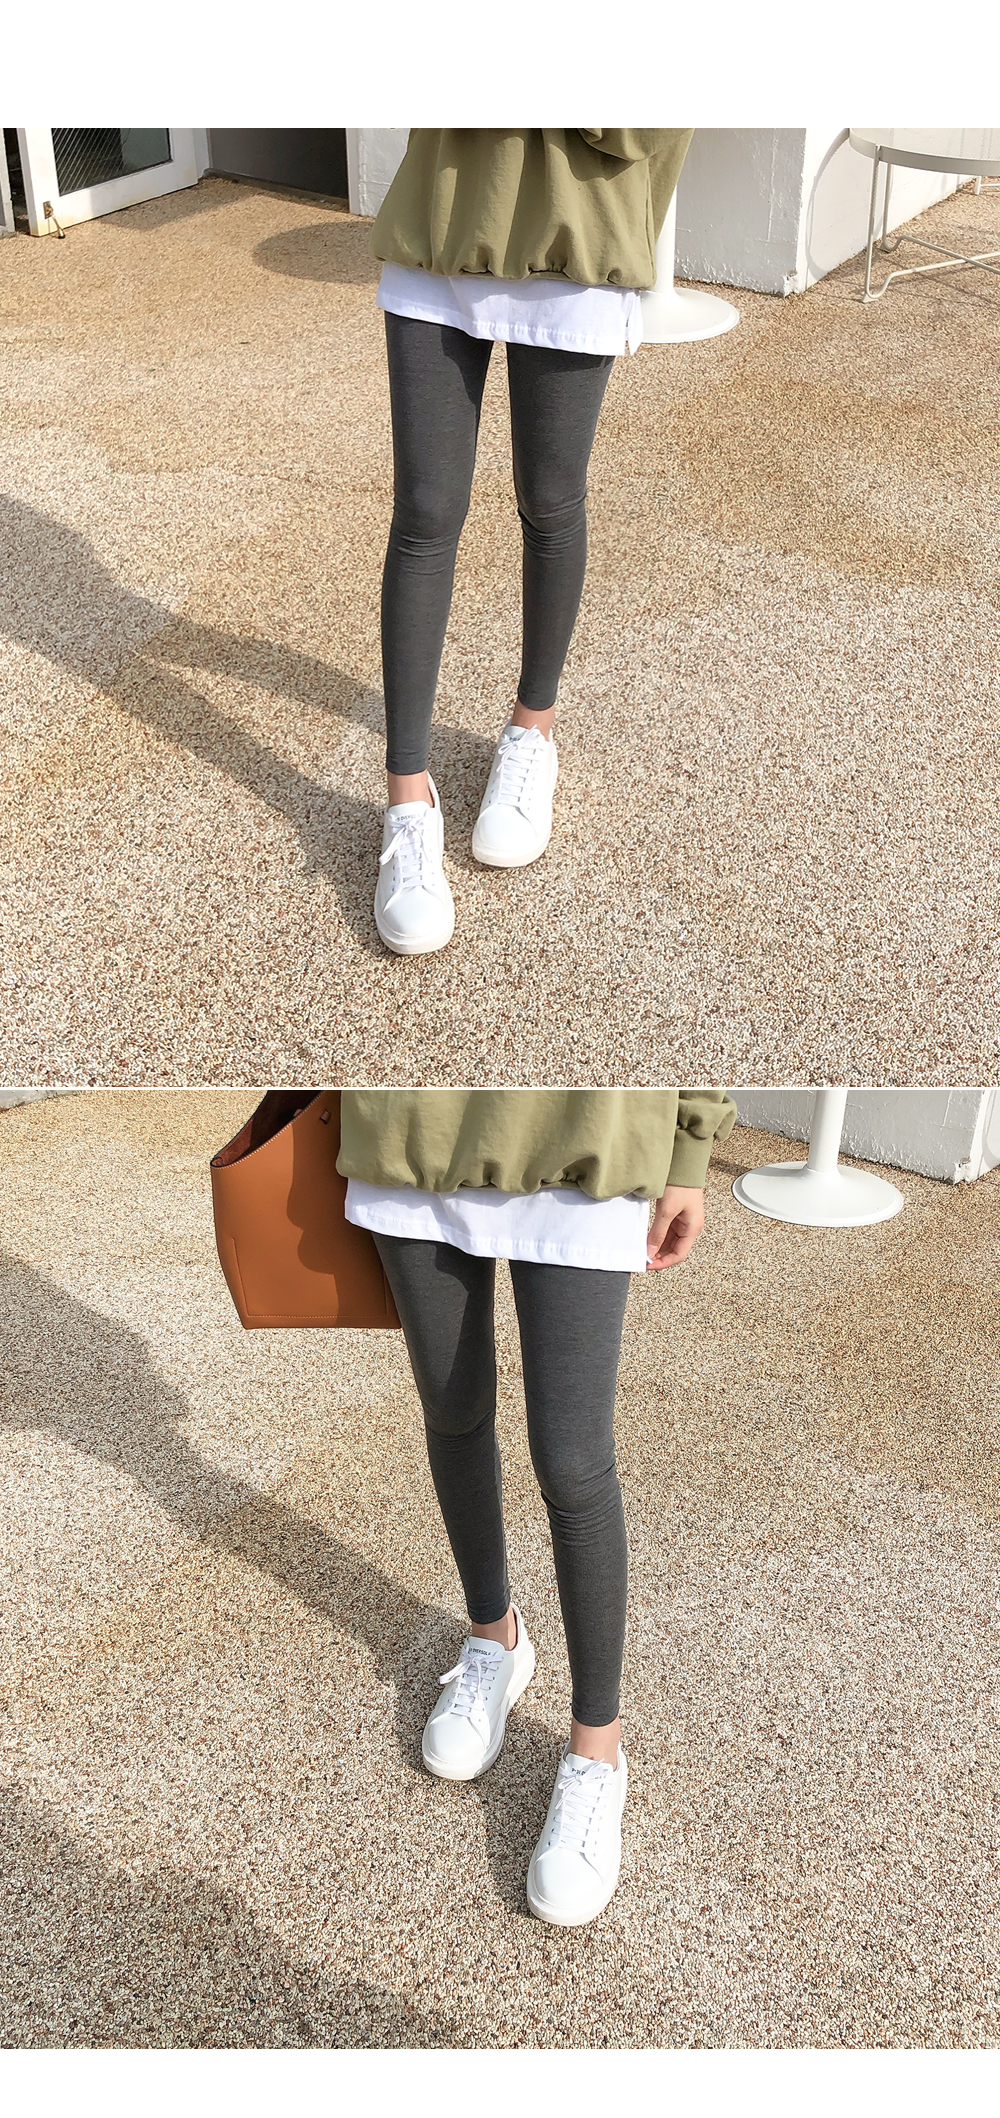 Simple skirt leggings